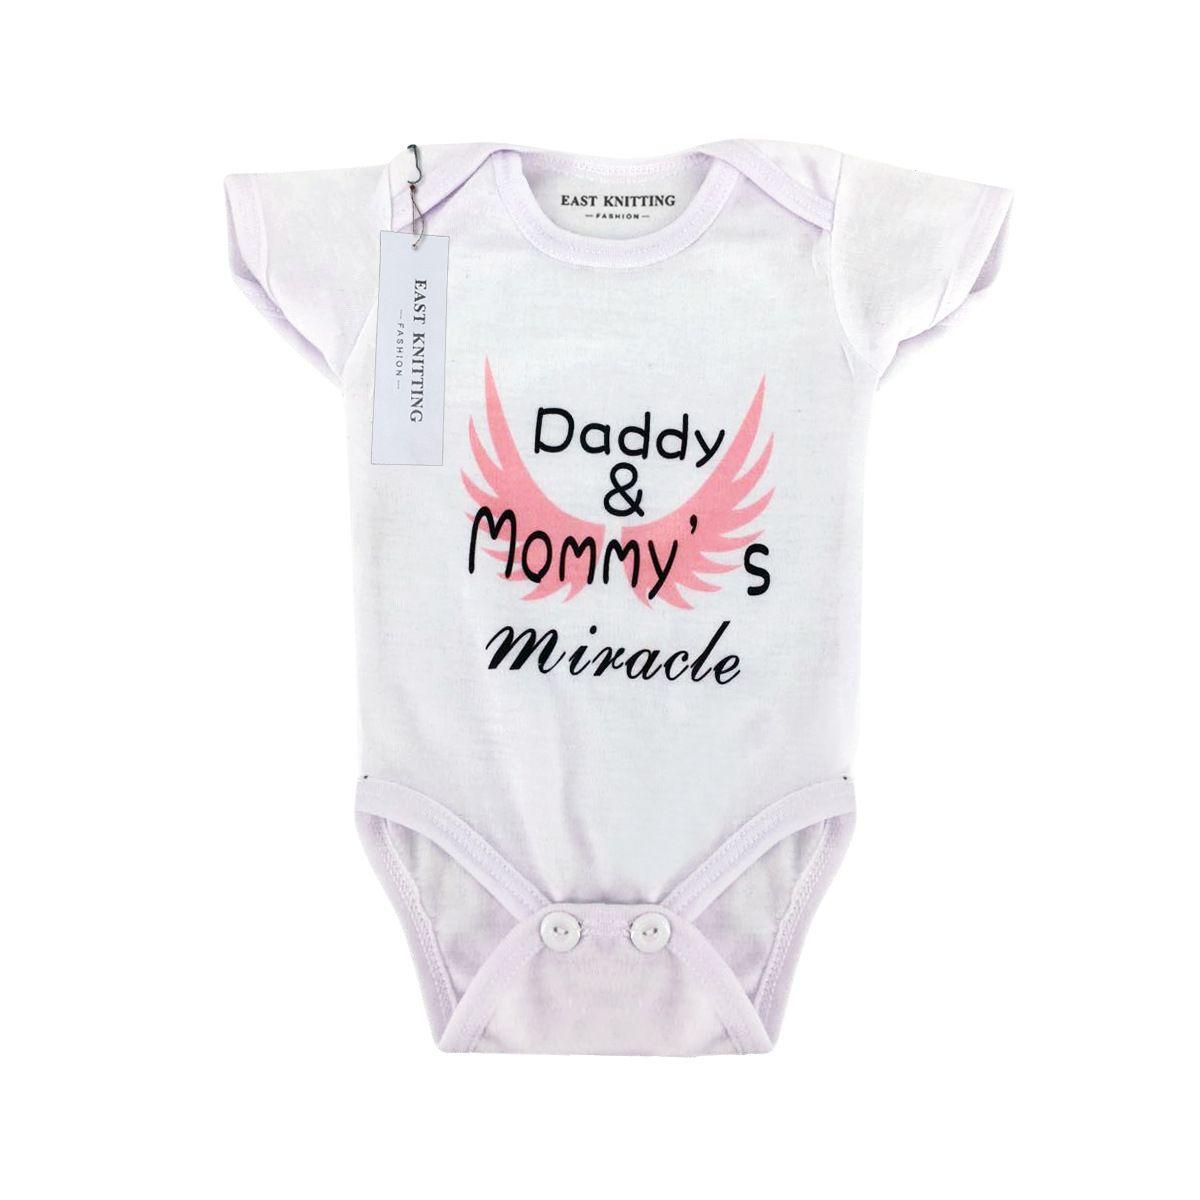 Letter Day 2020 New Spring Summer Baby Jumpsuit Moda Newborn Baby Kids Meninas Meninos roupa do Pai Imprimir Romper Roupa